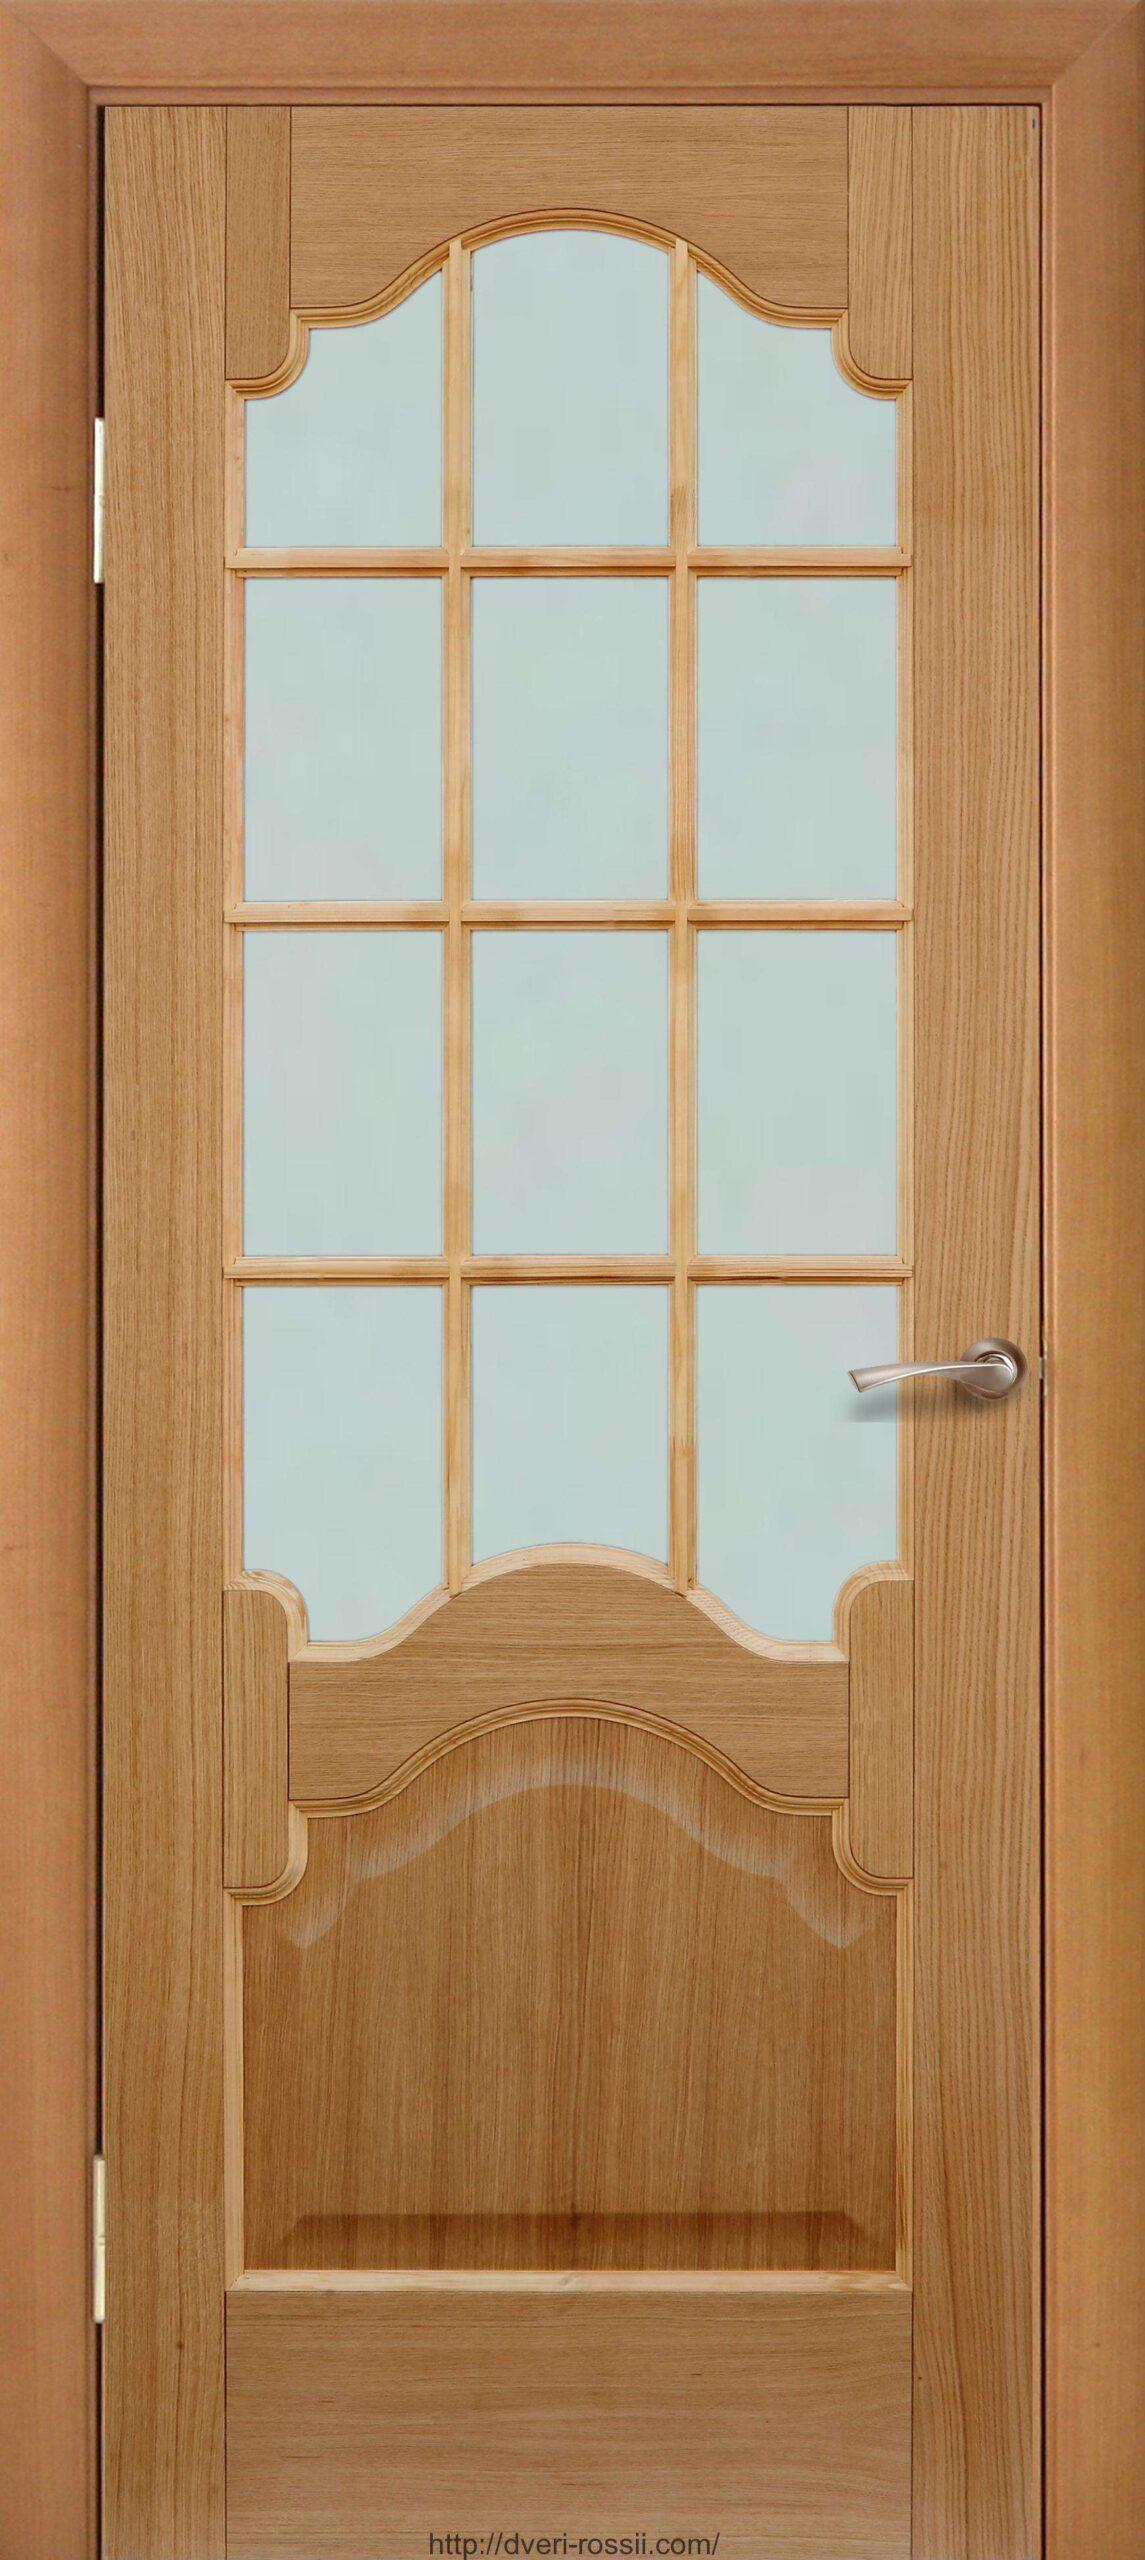 Купить двери фабрики Терминус